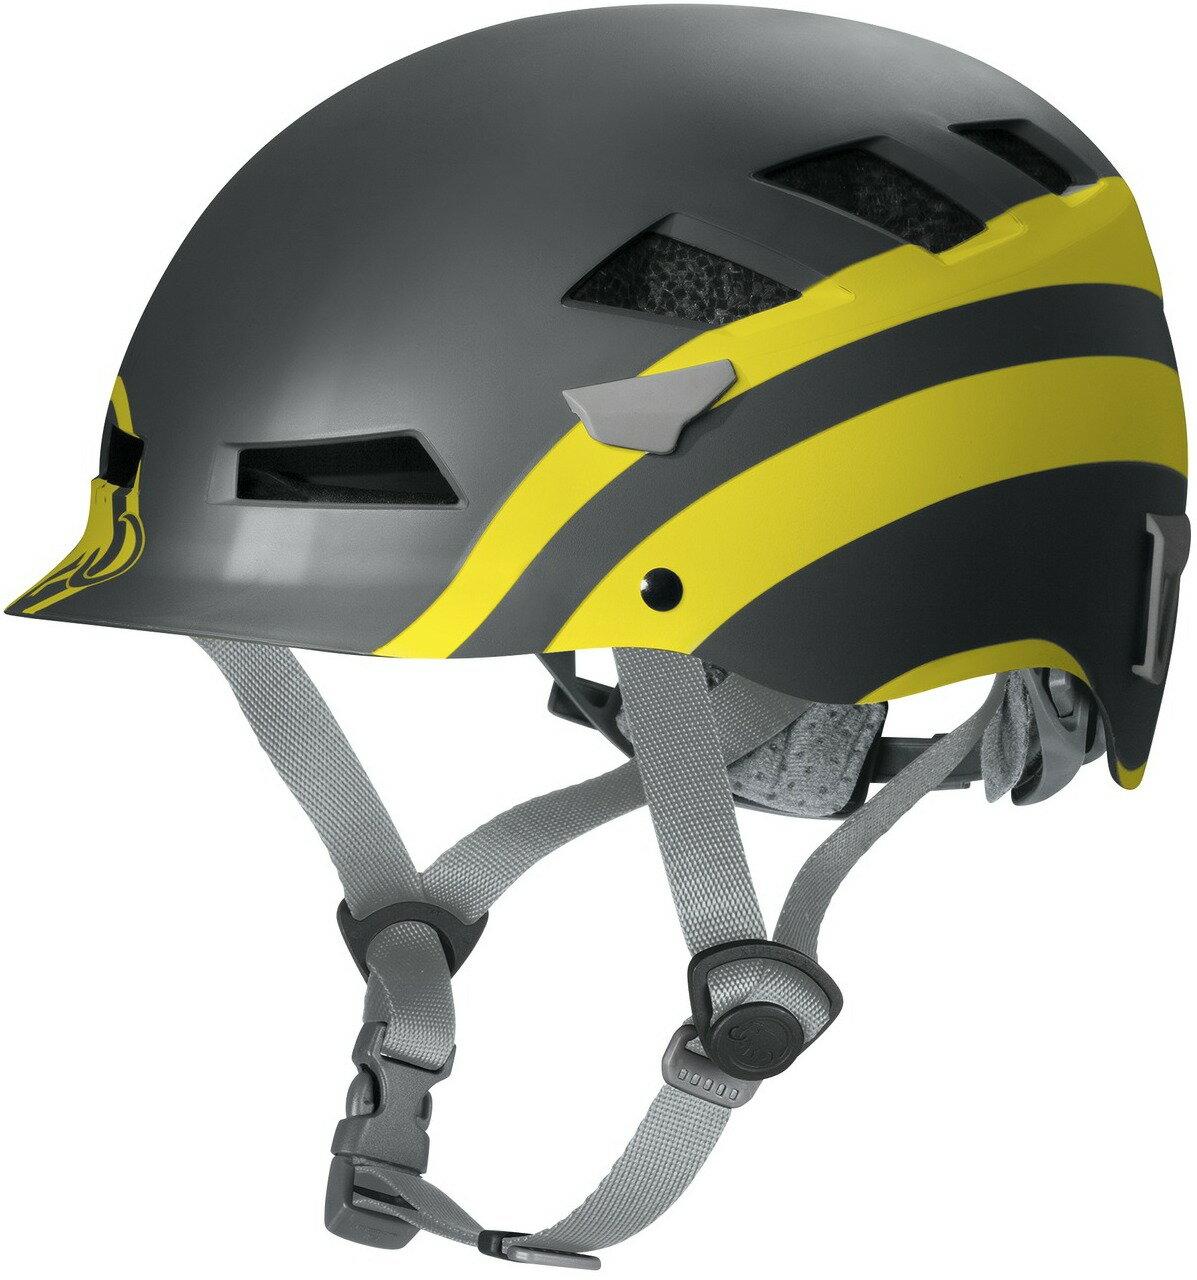 Mammut 長毛象 頭盔/岩盔 El Cap Helmet 2220-00090 5698影灰 瑞士長毛象/台北山水